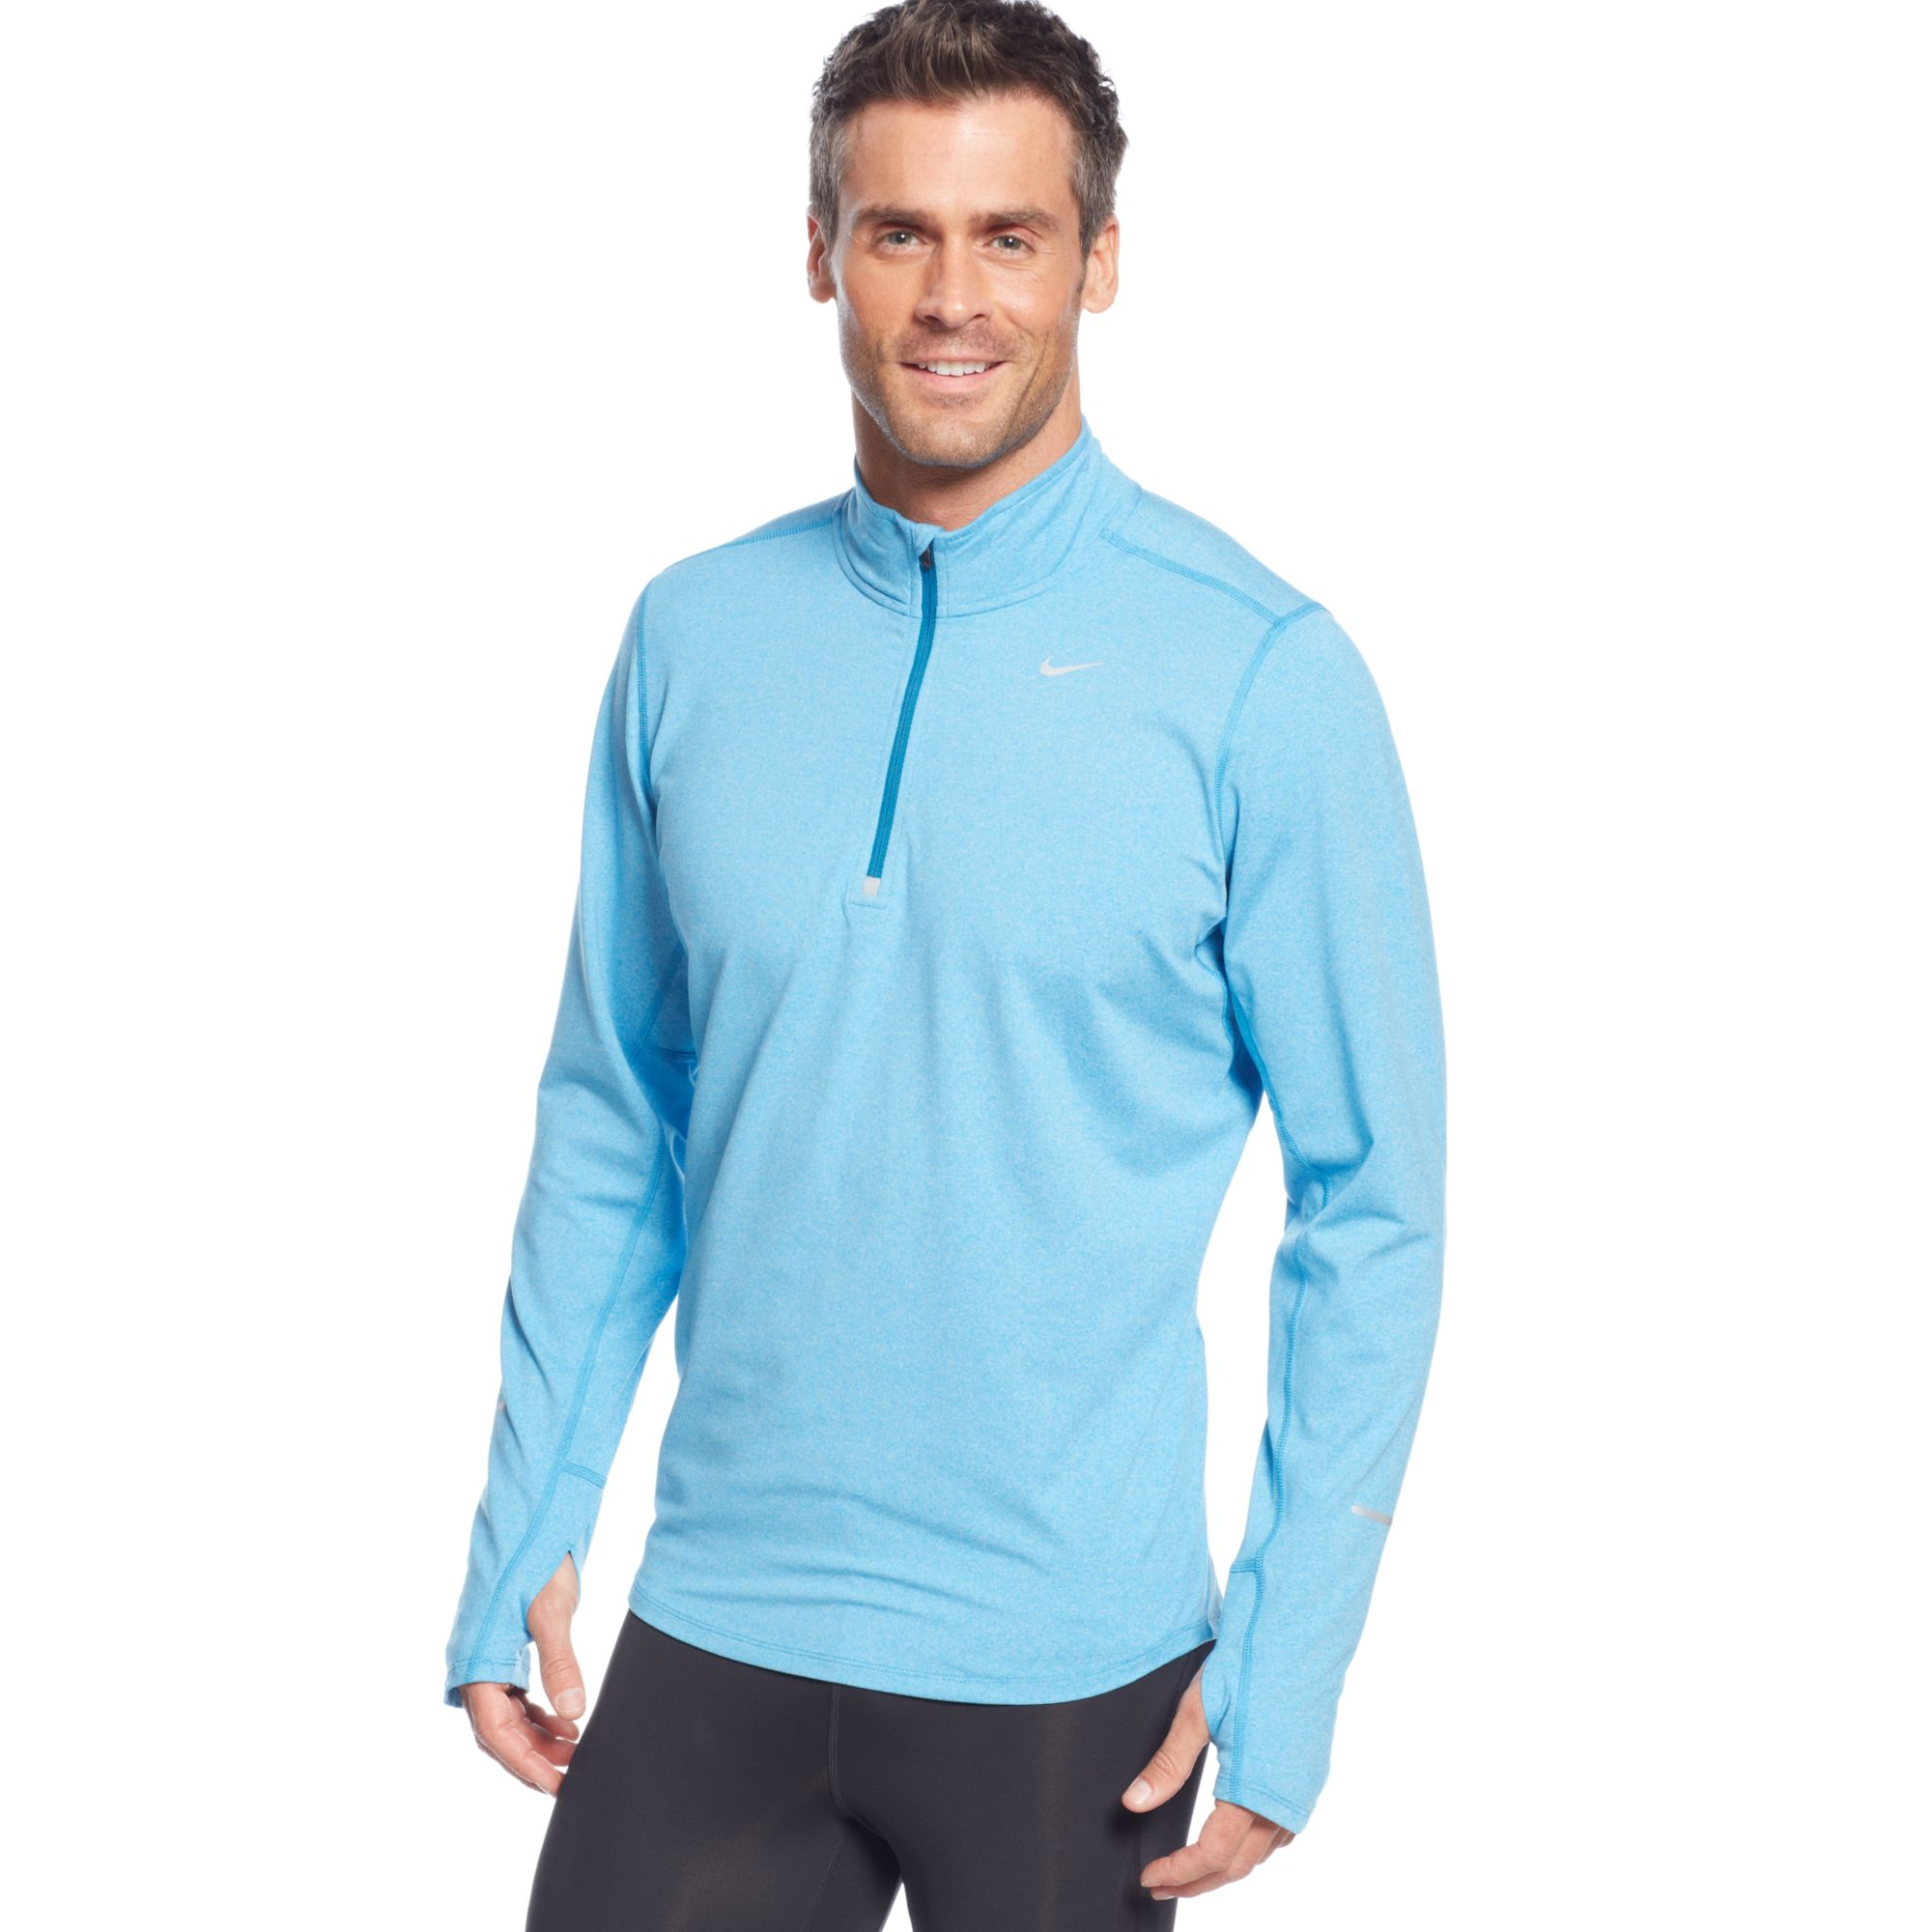 119a9466c6249 Nike Blue Pullover Element Half Zip Shirt for men